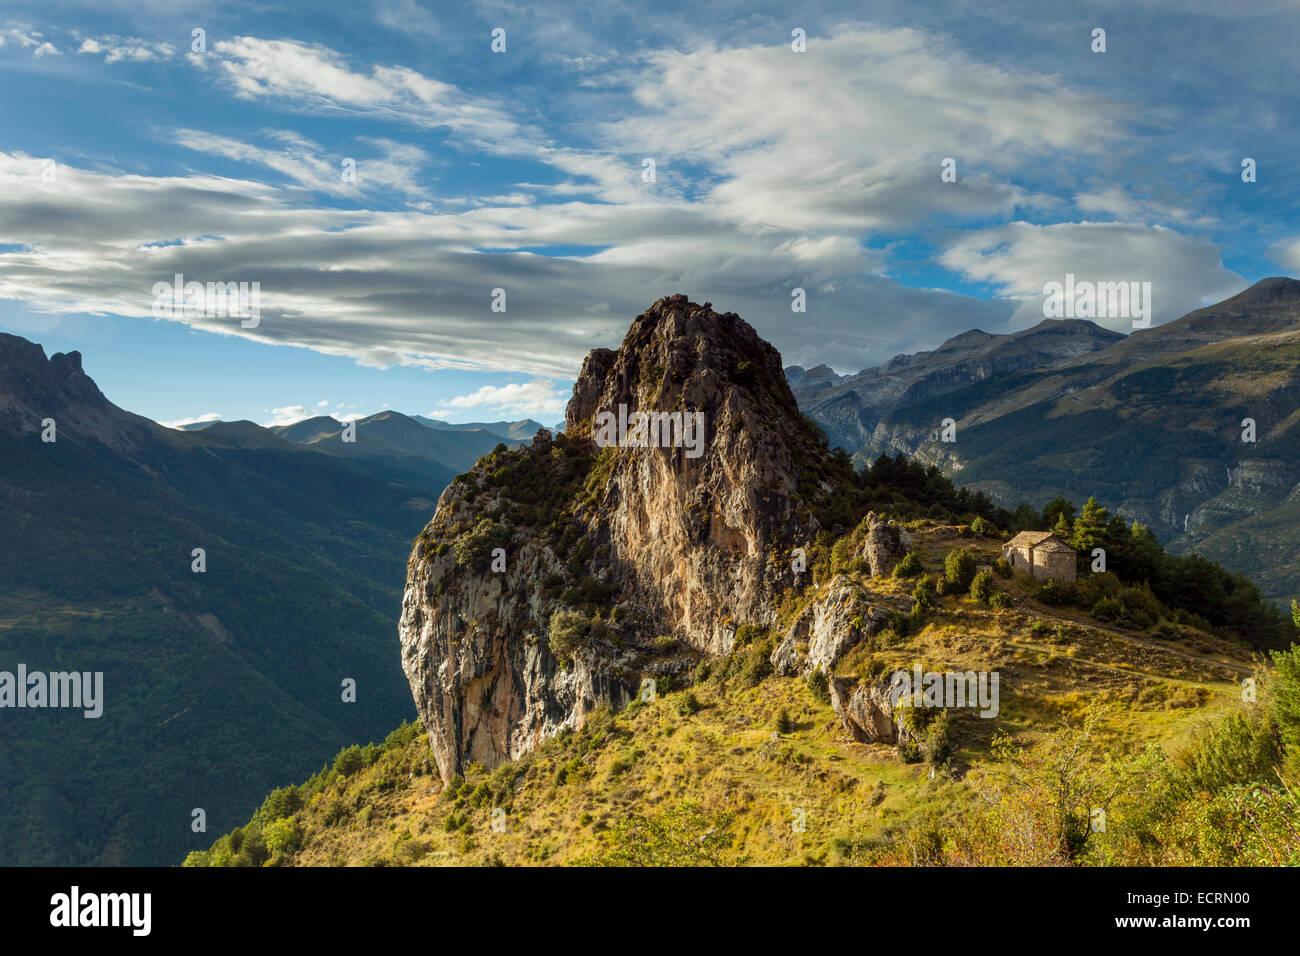 Pyrenees mountains near Tella, Huesca, Aragón, Spain. Ruta de las ermitas (Hermitage route). Stock Photo